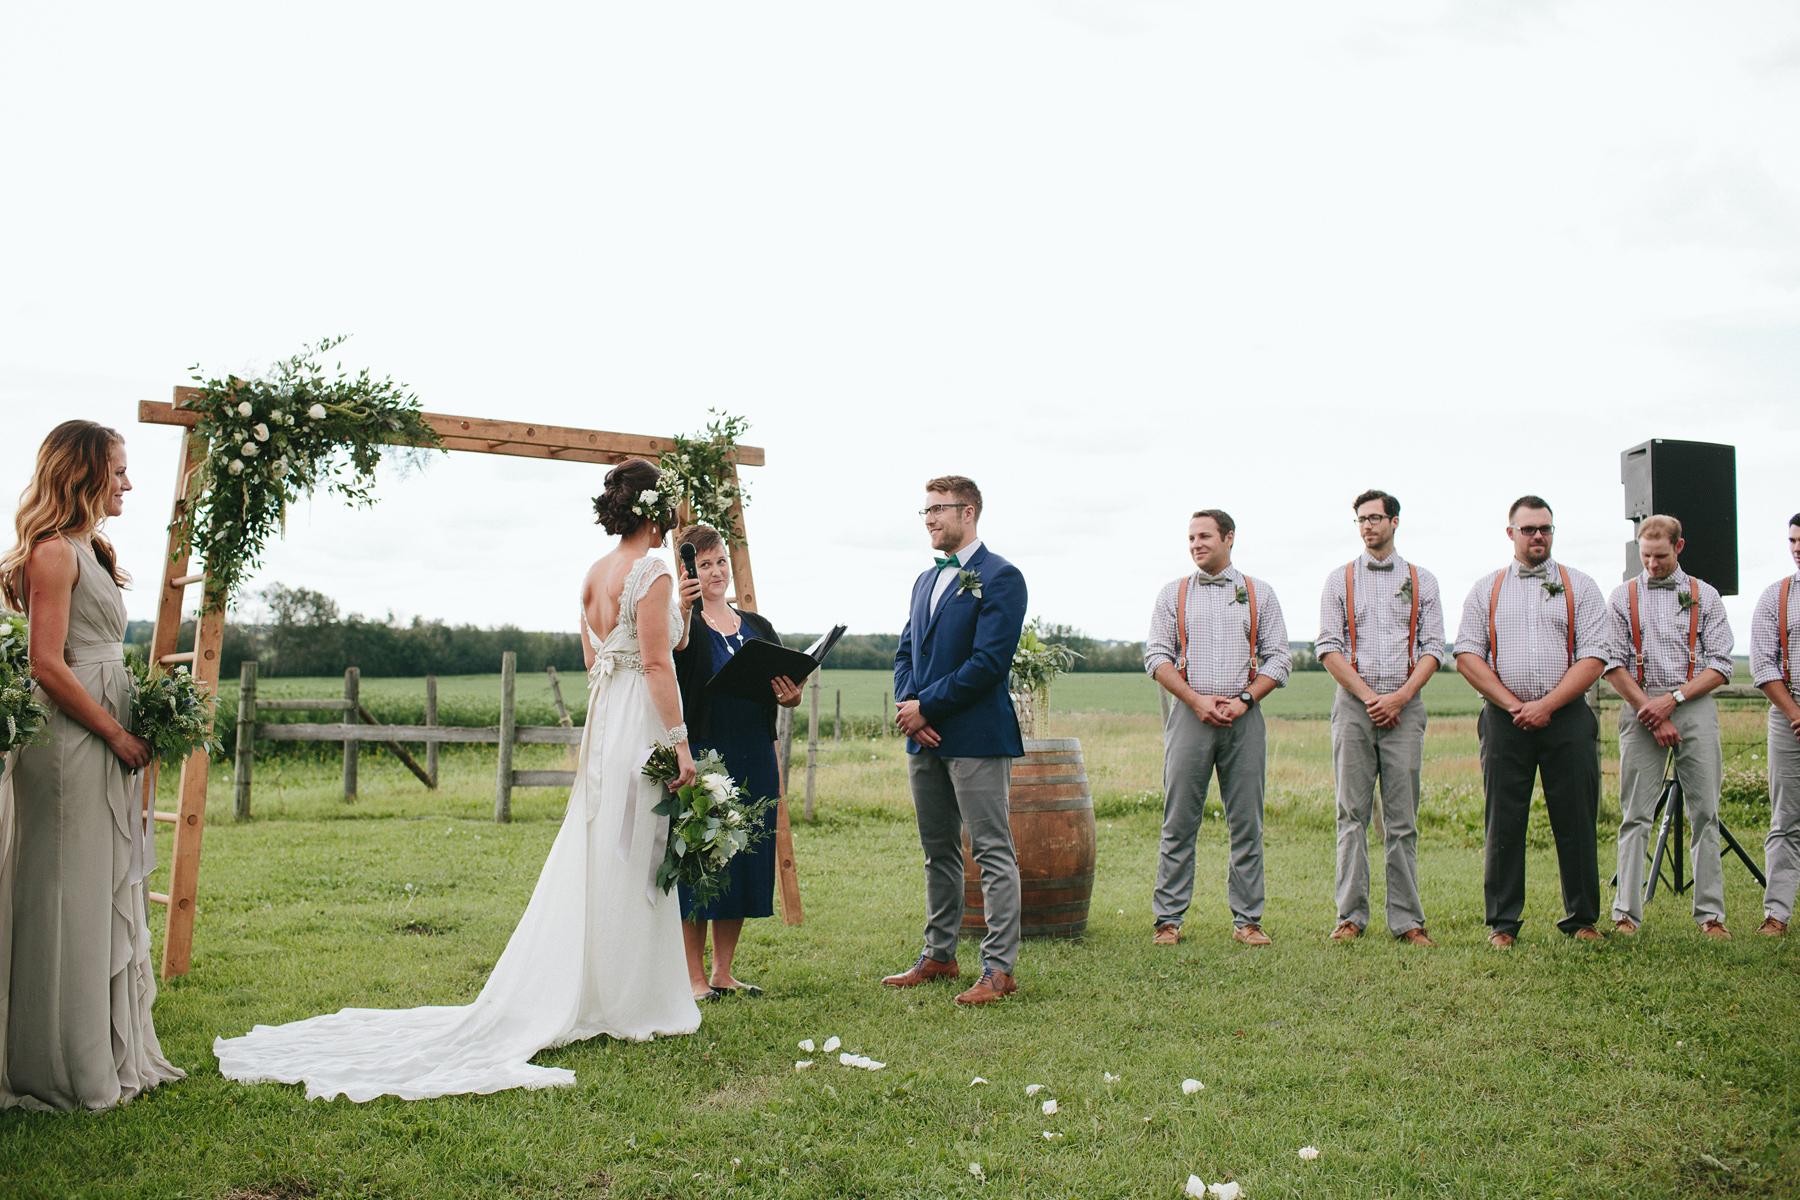 alberta-farm-wedding-photographer-rp-wj-109.jpg